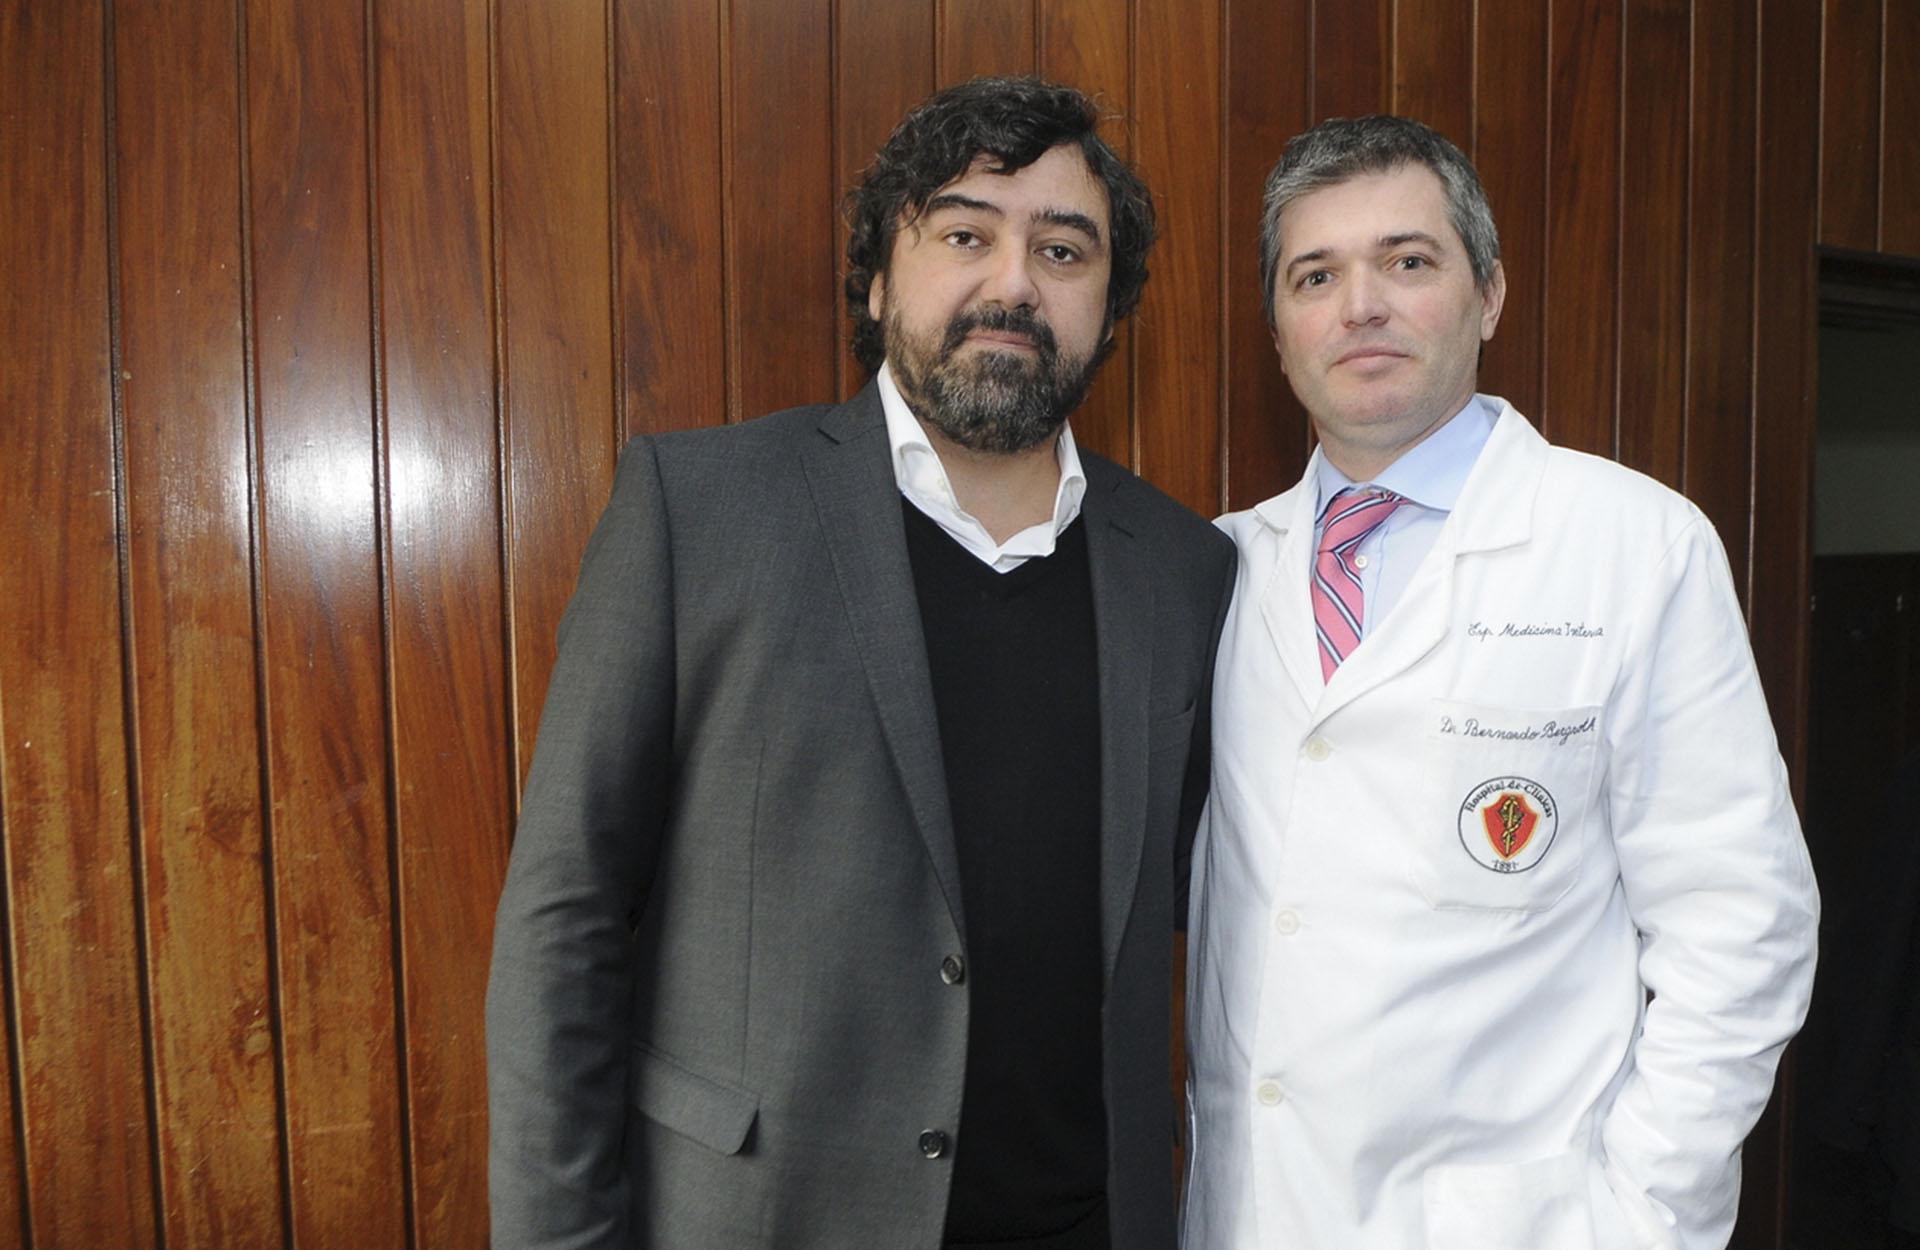 Juan Cruz Ávila y Bernardo Bergroth